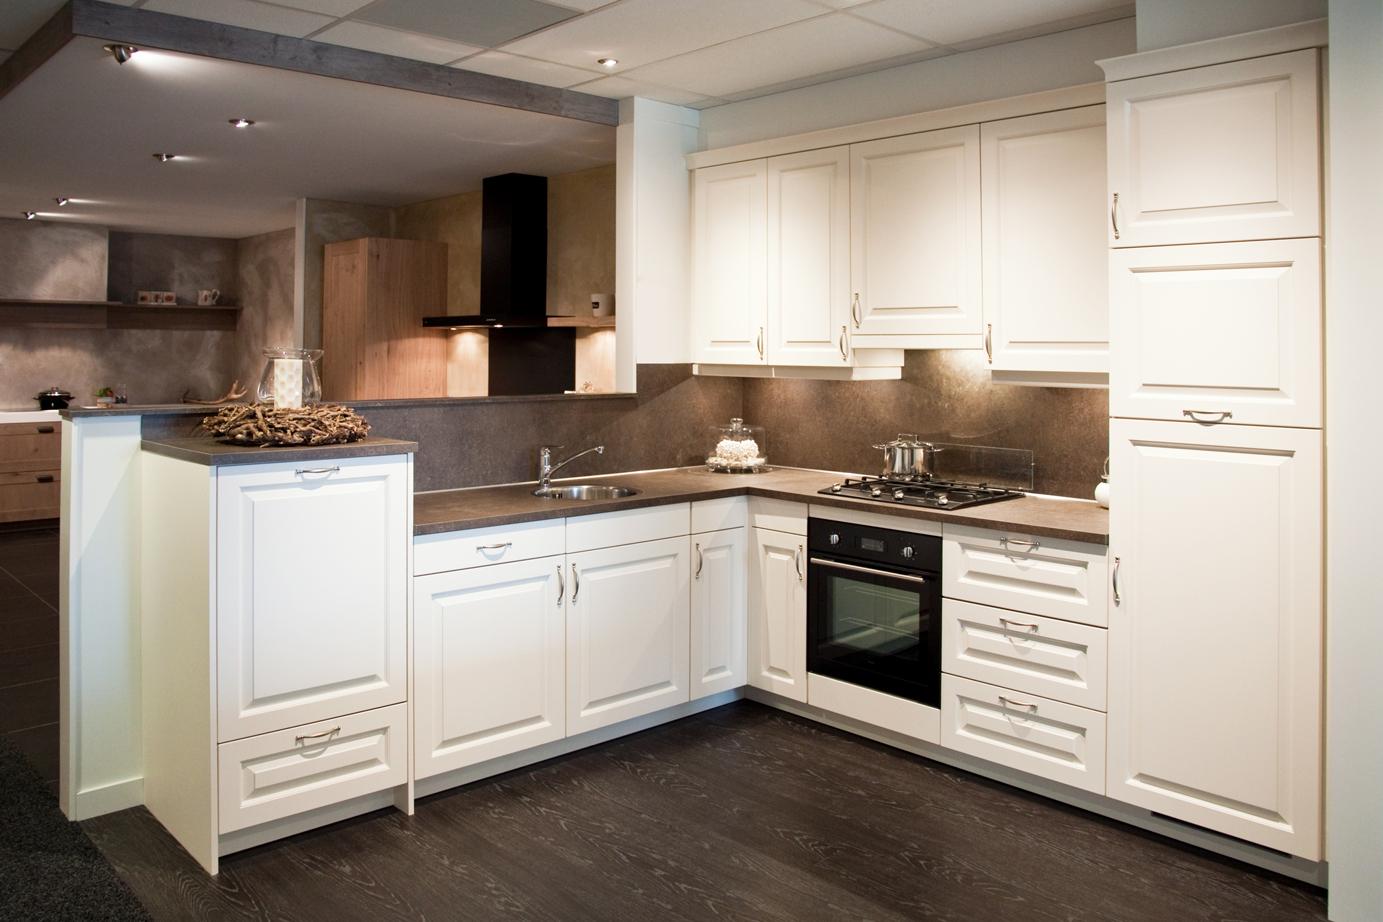 Keuken Zonder Apparatuur : Landelijke keuken Incl set Pelgrim apparatuur DB Keukens